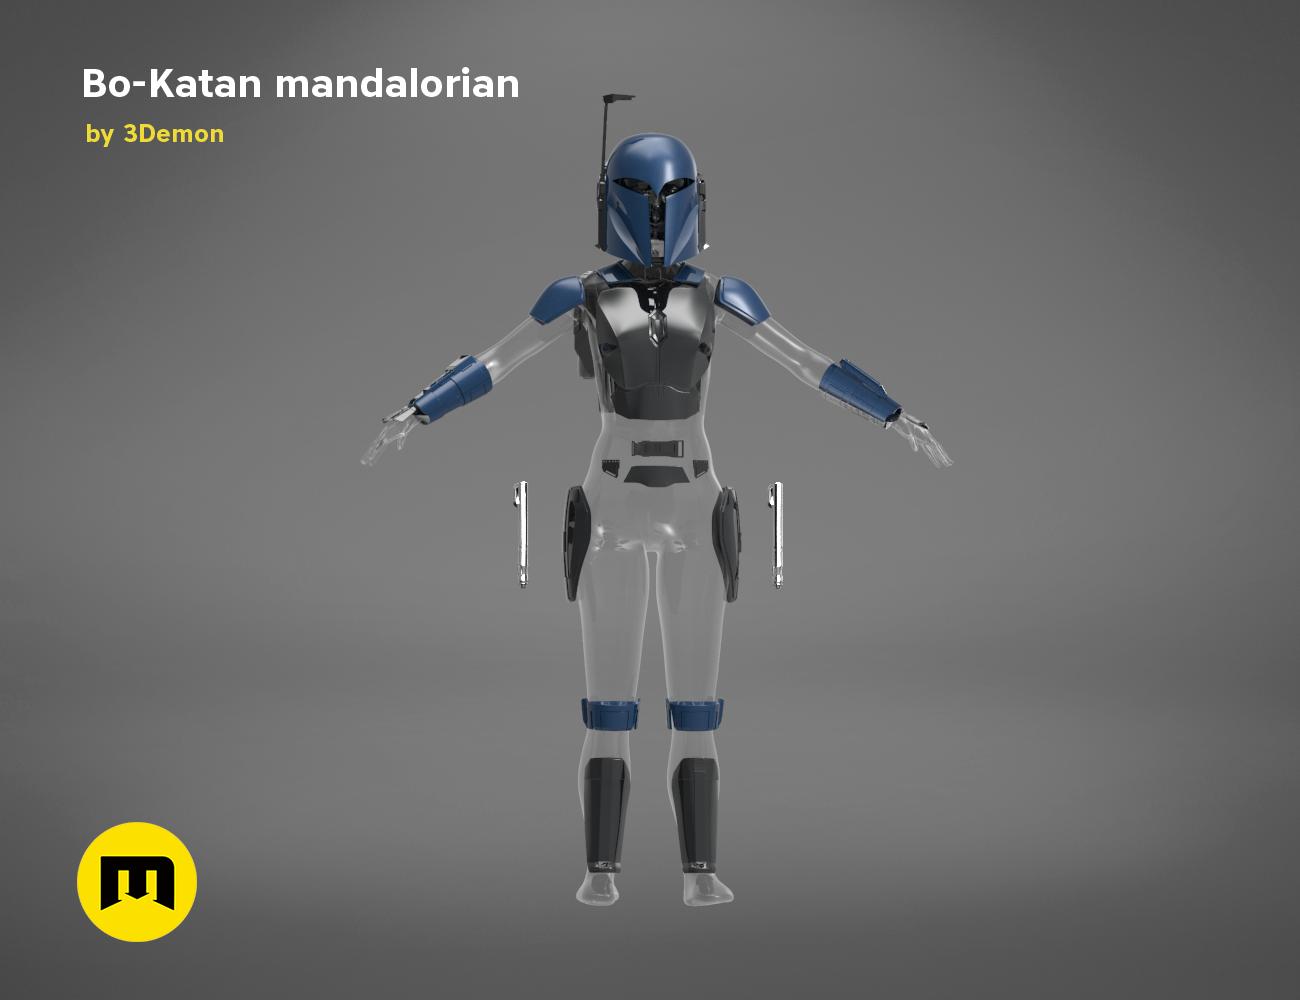 Mandalorian Female Armor Set 1 Star Wars - The Mandalorian Bo Katan Armor Pieces - PDF Pattern for Foam Cosplay